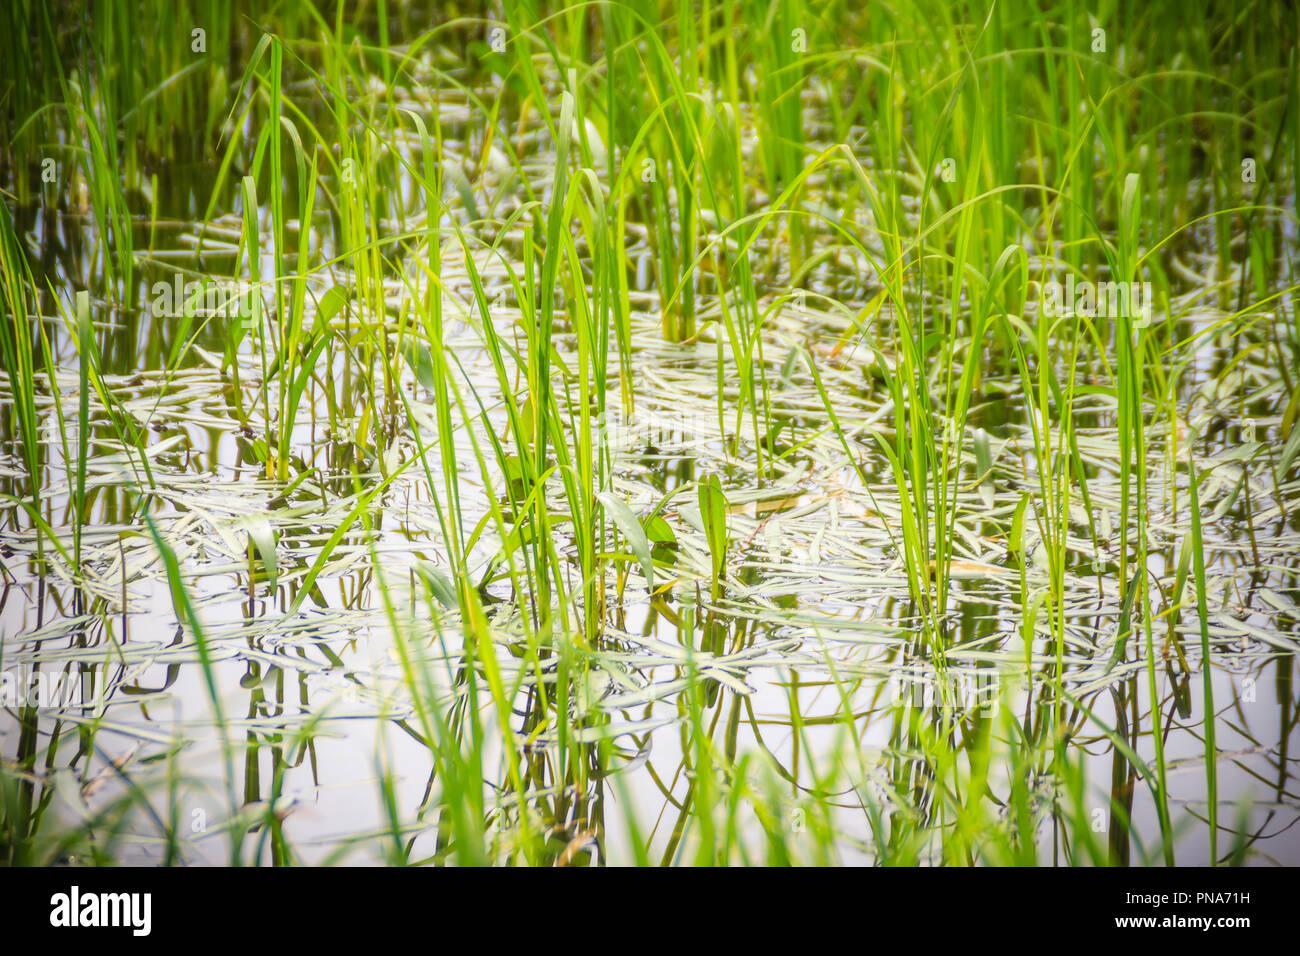 Grass Pickerel Immagini   Grass Pickerel Fotos Stock - Alamy 086db1ec3a0a